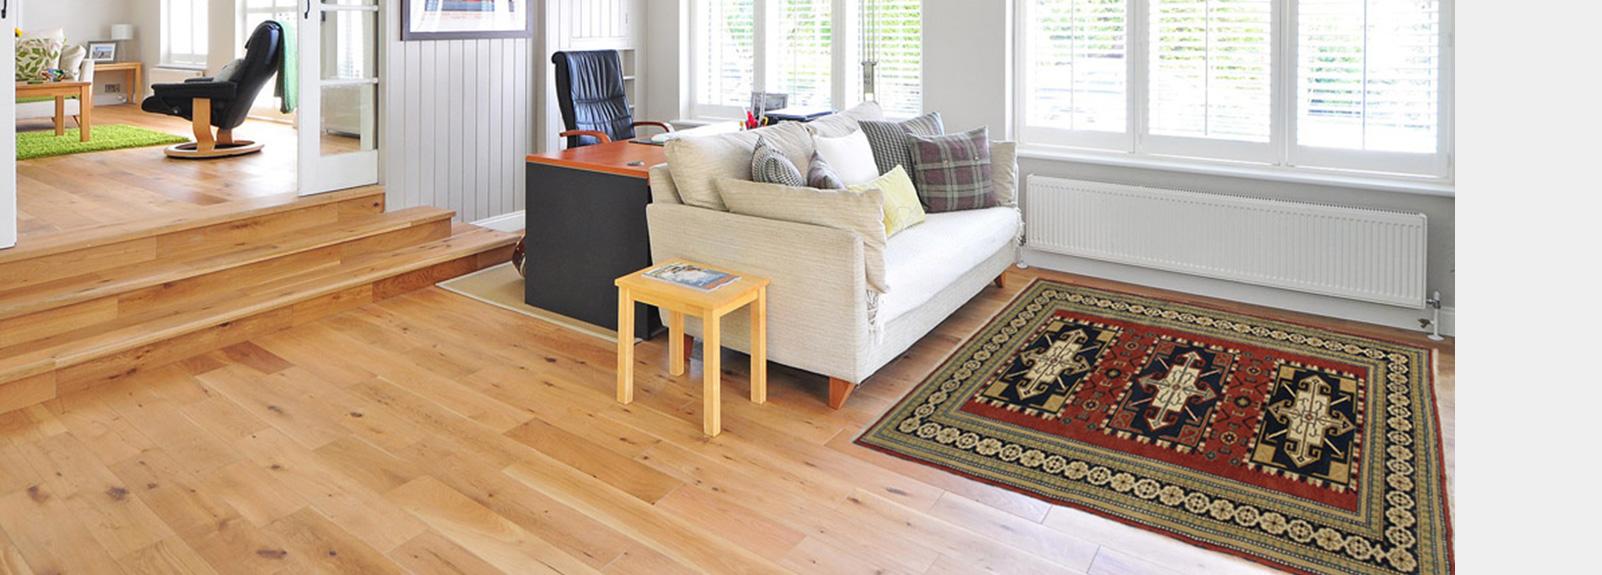 Tappeti usati online | Outlet Tappeti | tappeti persiani usati ...